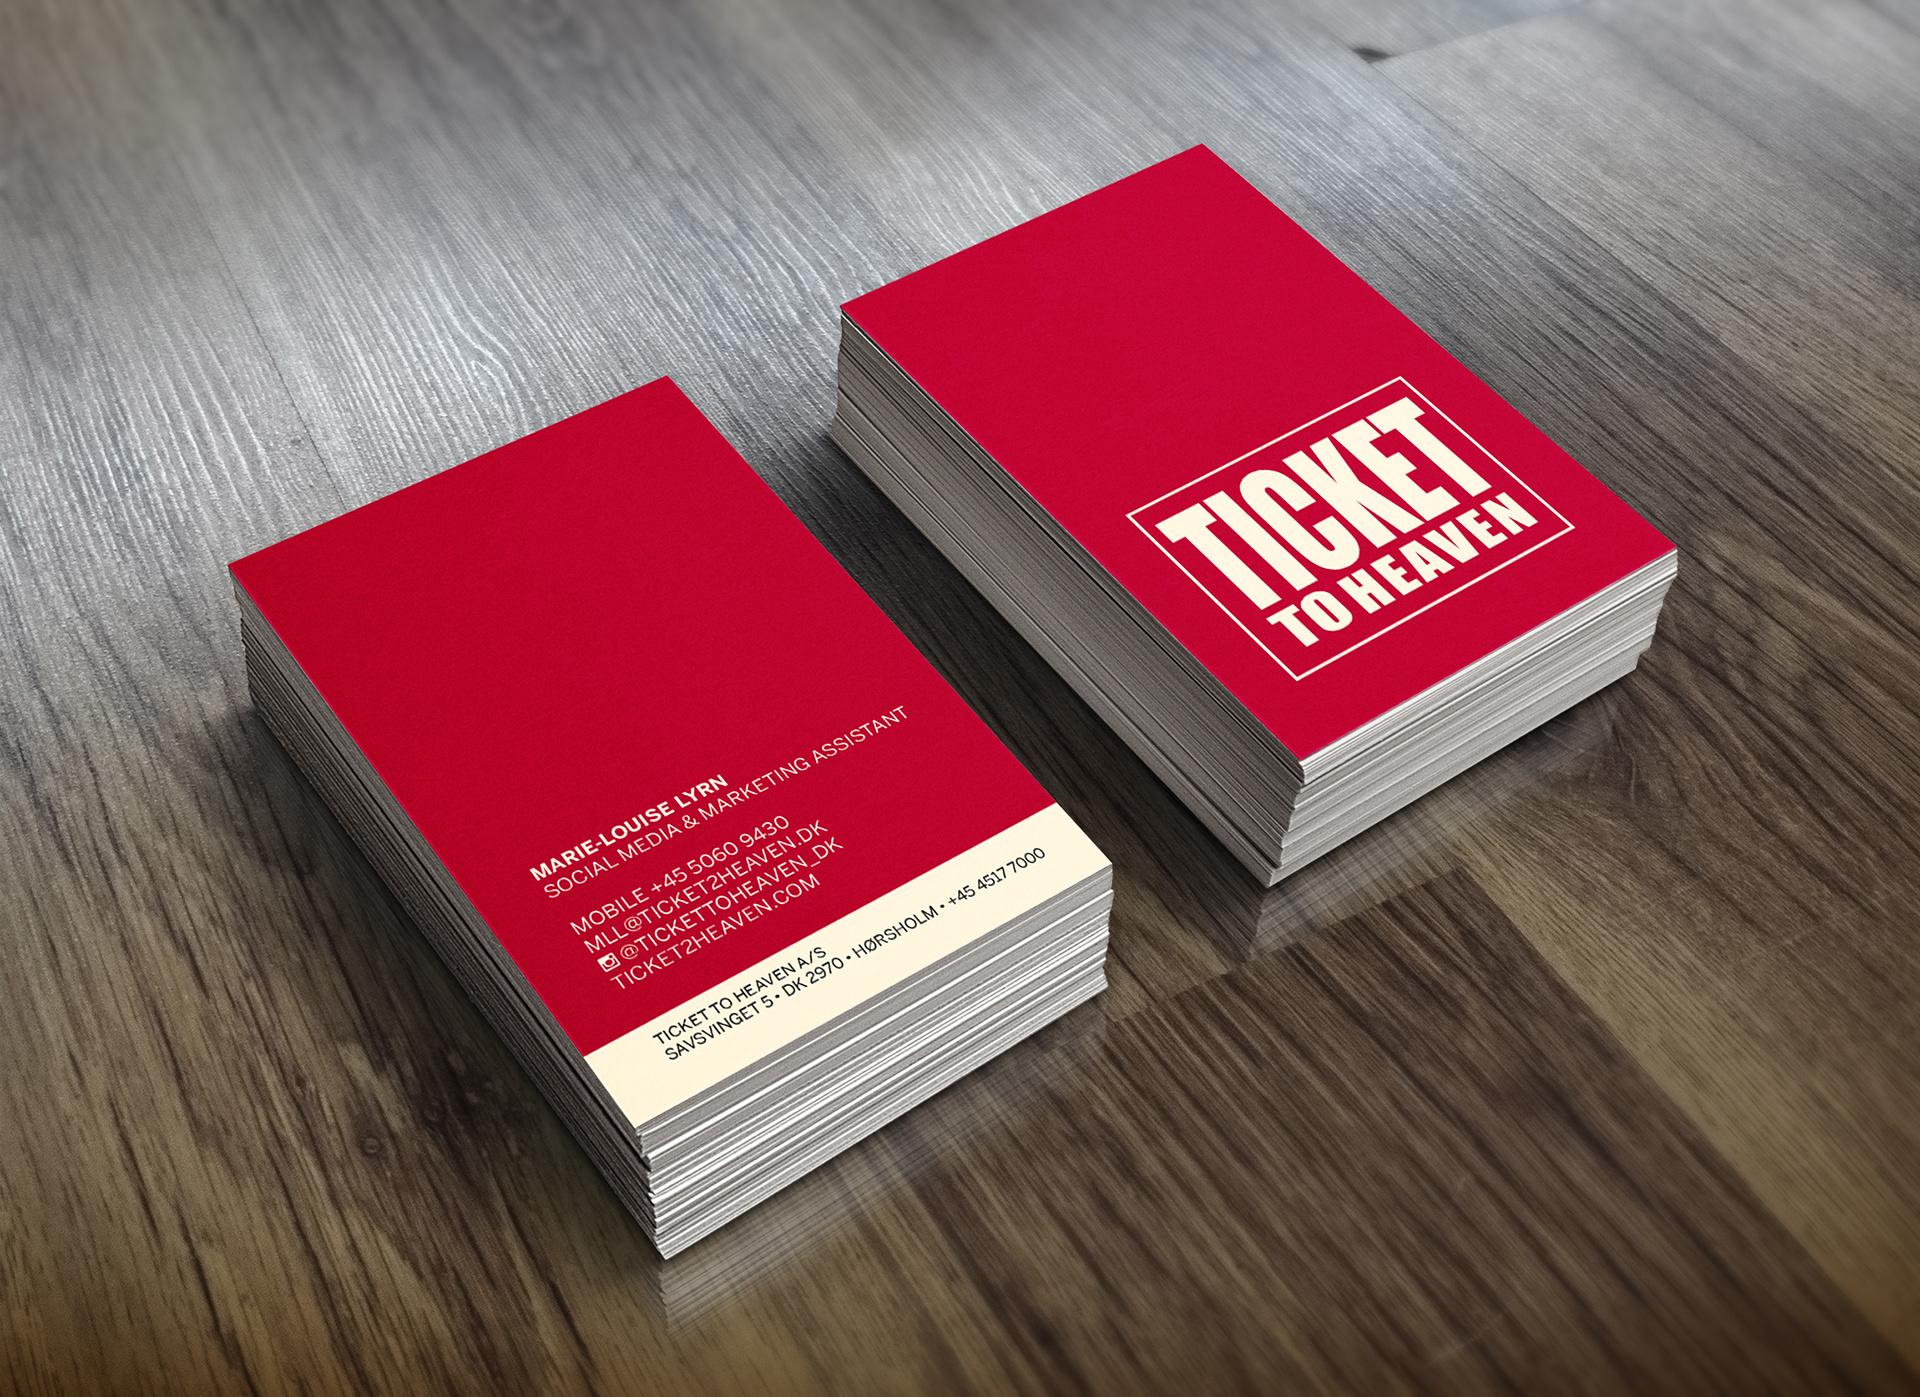 Lilja bjrk business cards for ticket to heaven business cards for ticket to heaven colourmoves